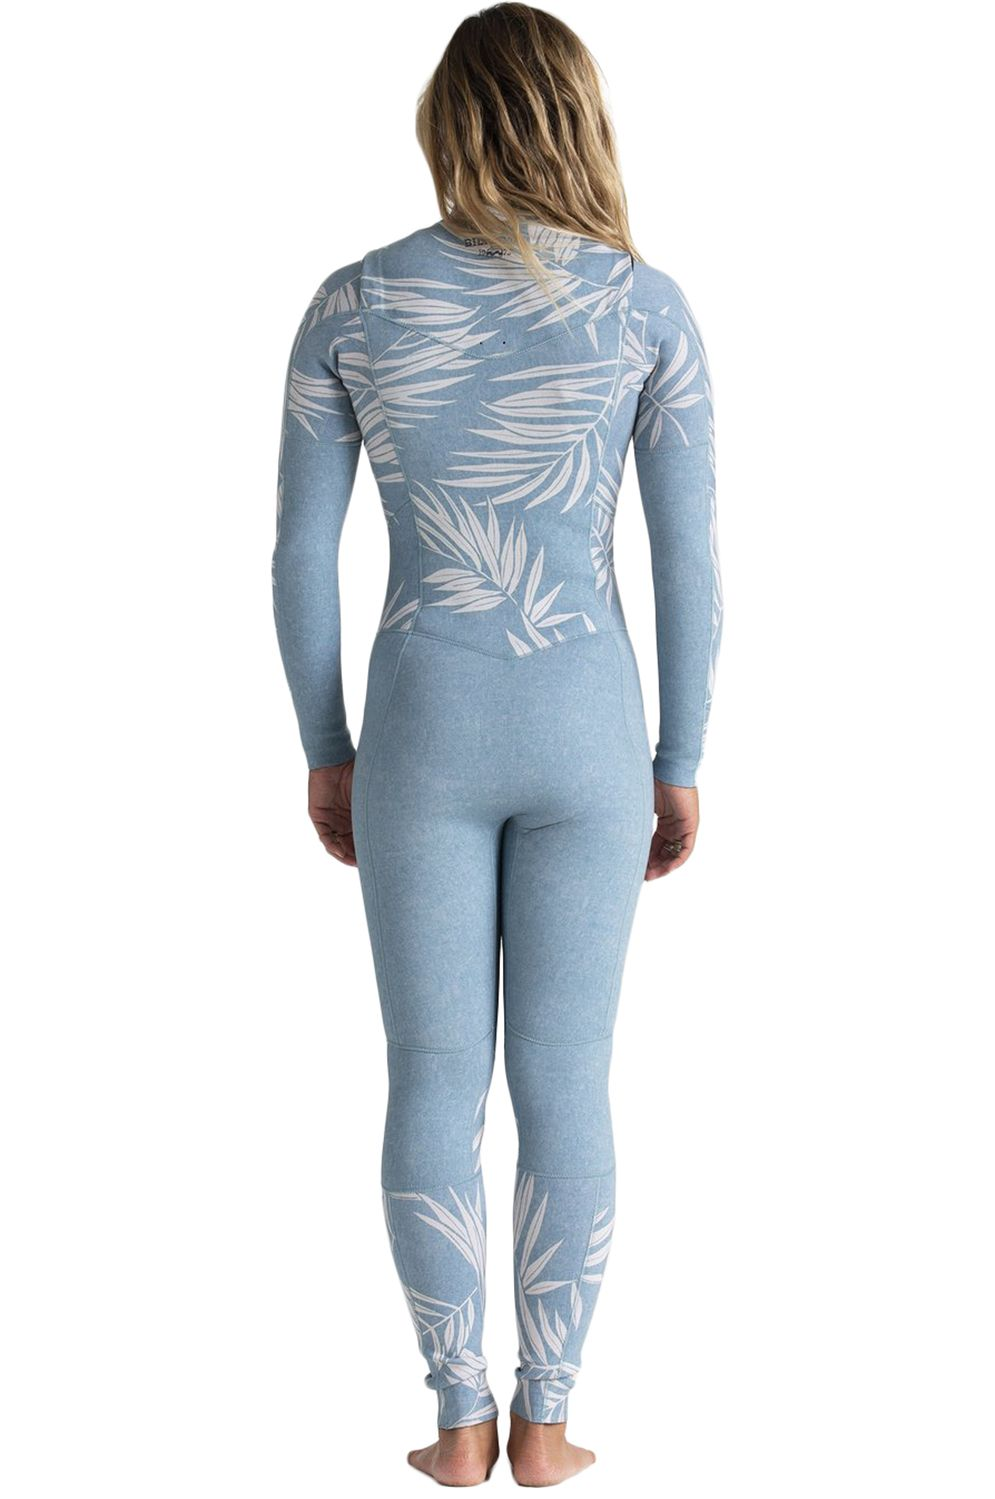 Billabong Wetsuit SALTY DAYZ FULL 403 SURF CAPSULE Blue Palms